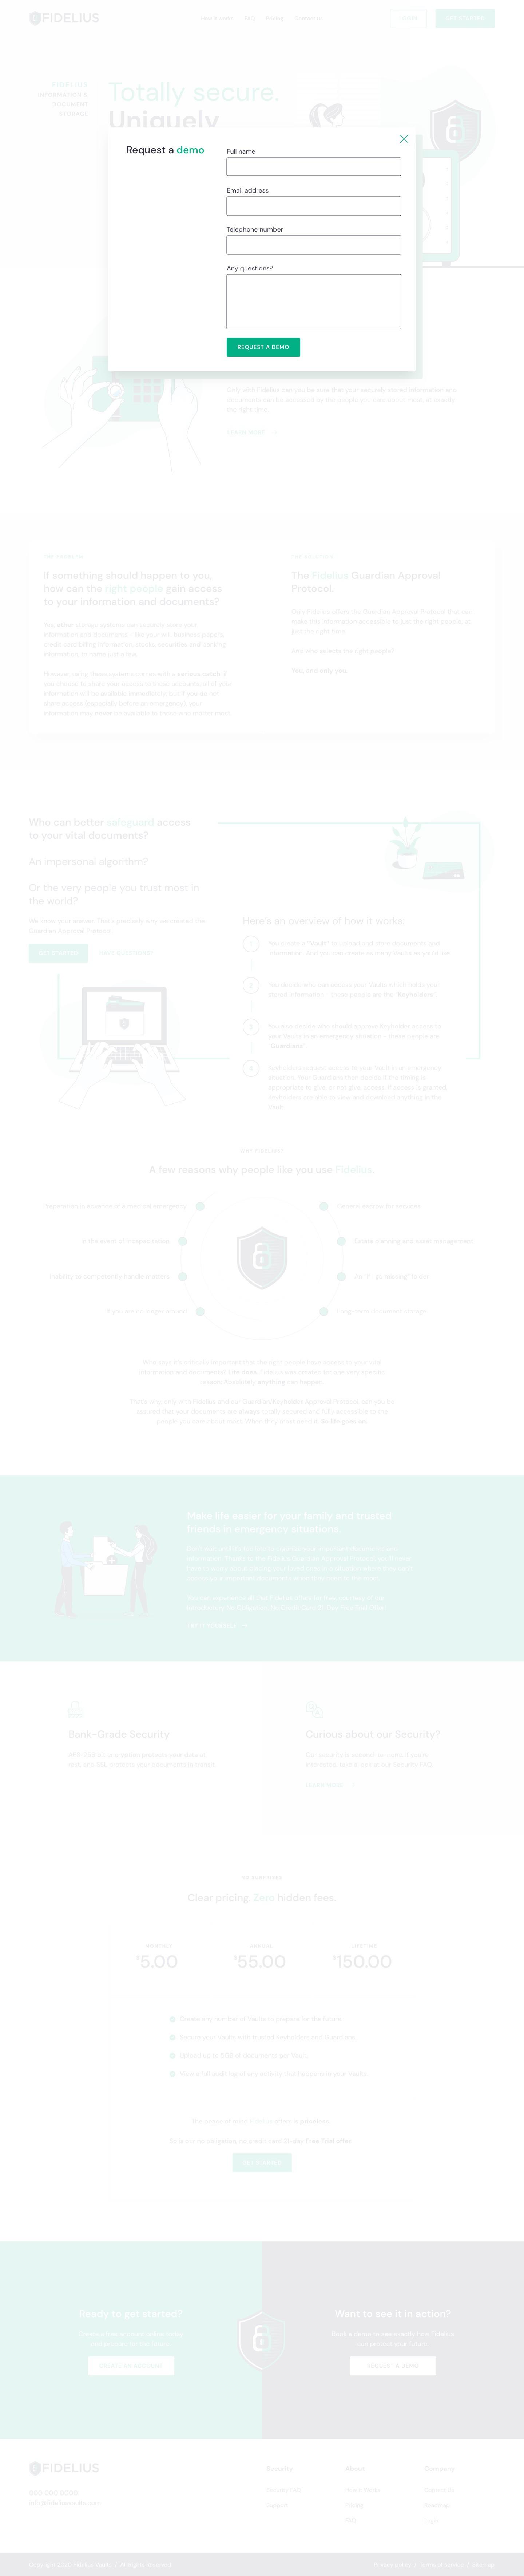 Fidelius Information & Document Storage